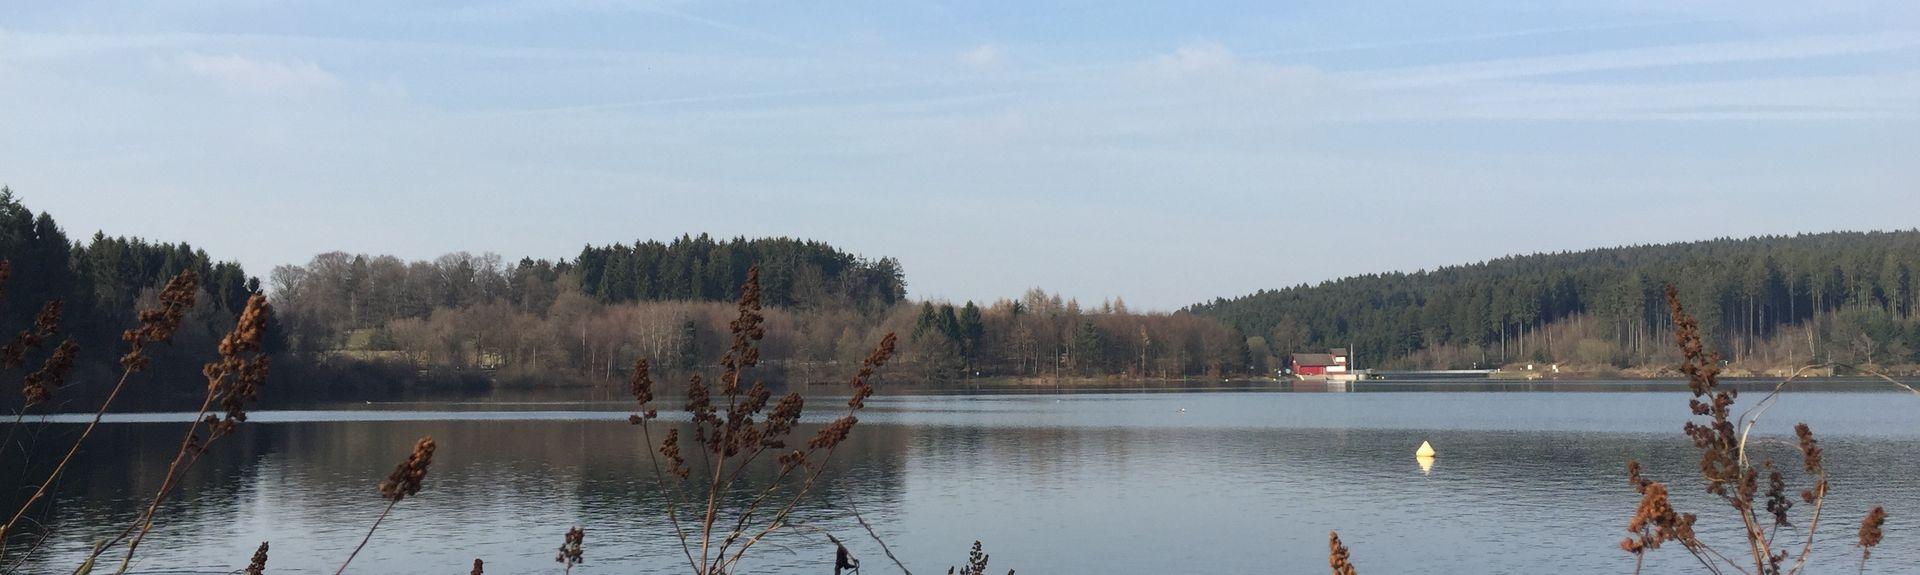 Lindlar, North Rhine-Westphalia, Germany